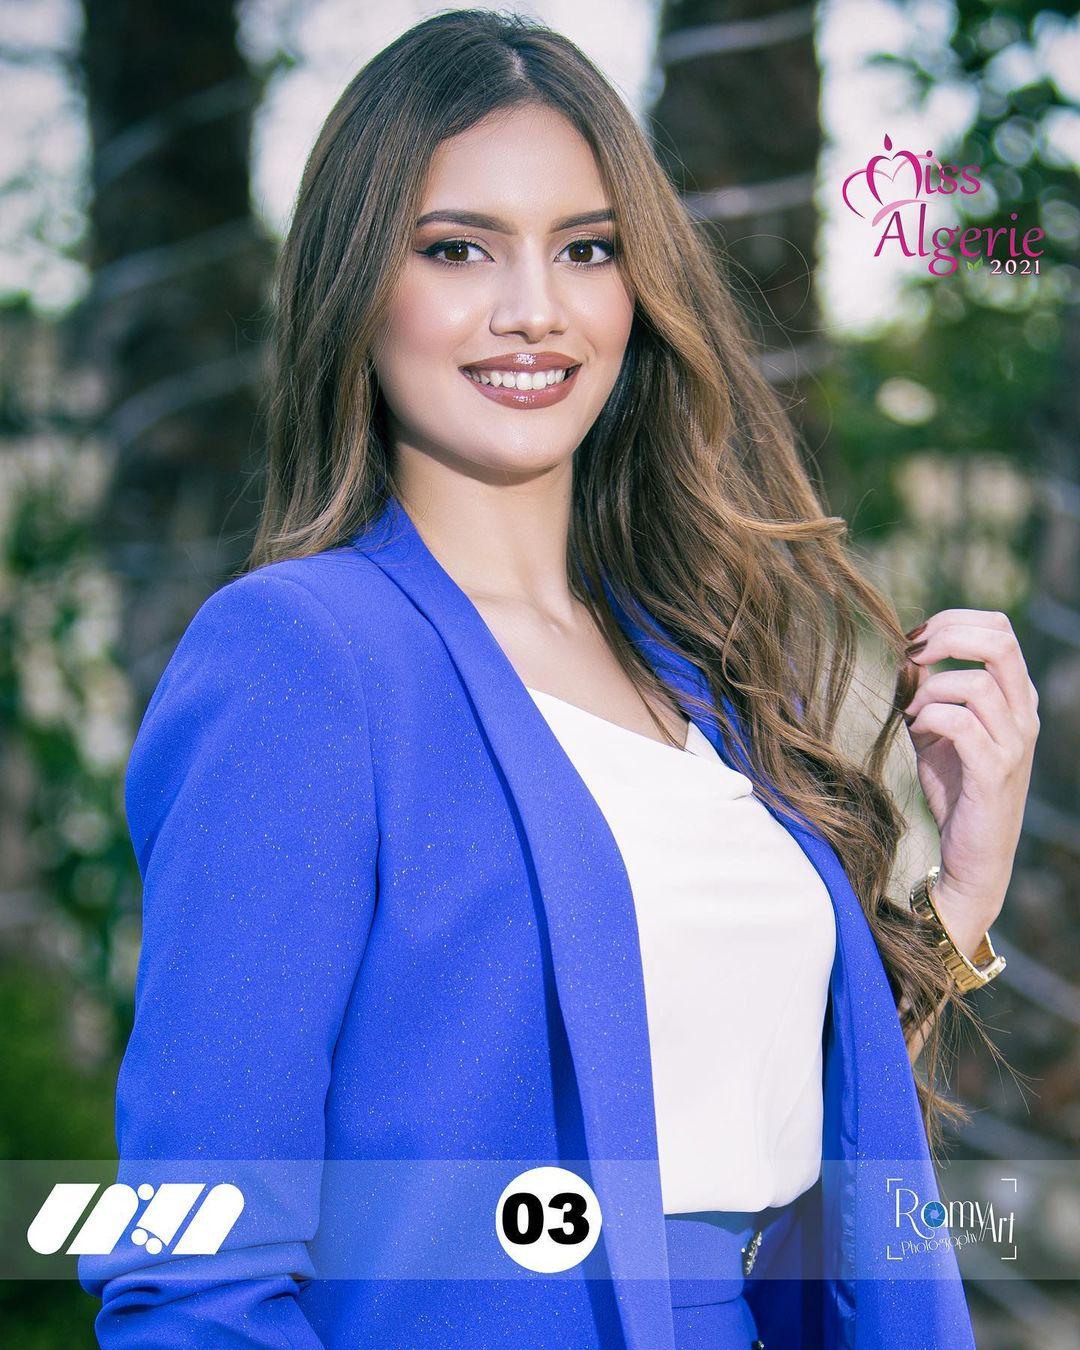 candidatas a miss algeria 2021. final: 12 feb. 7Pxyku